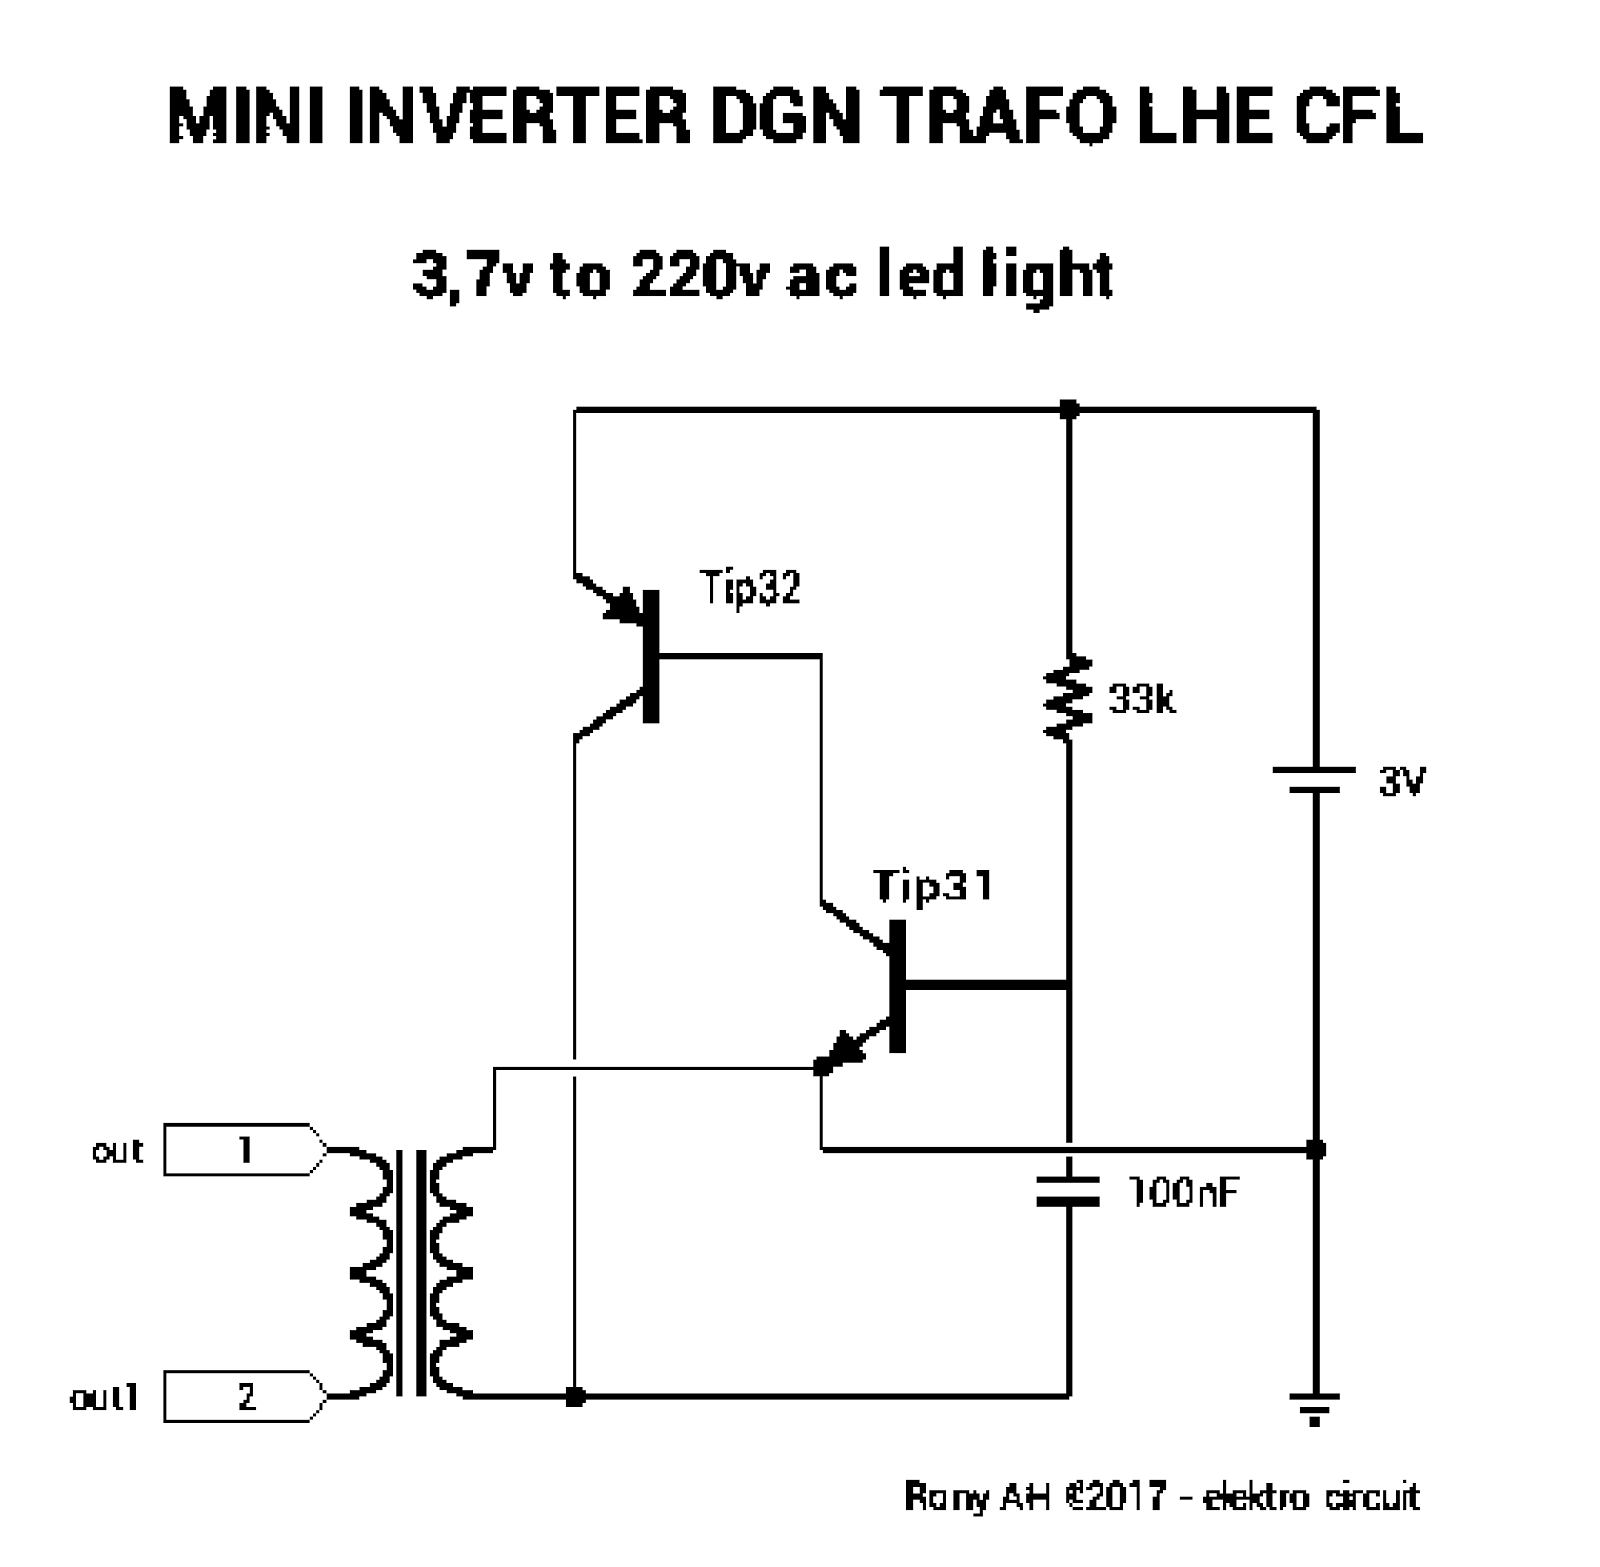 10 Watt Led Driver Circuit Diagram Minn Kota Trolling Motor Parts Membuat Inverter Dgn Trafo Lhe Cfl Kumpulan Skema